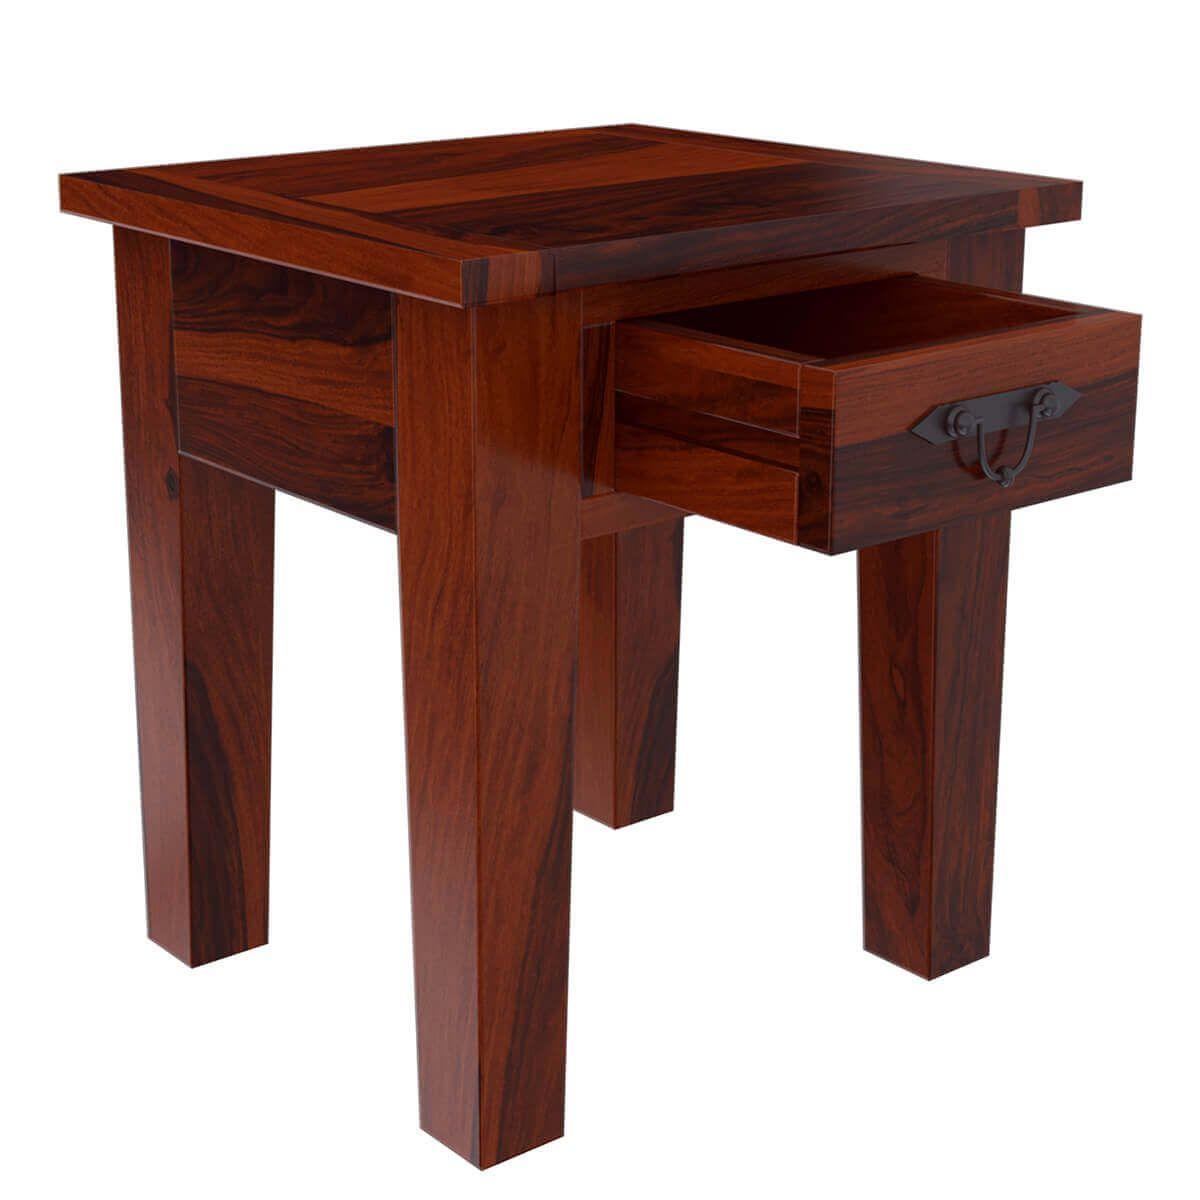 Tierra Rustic Style Solid Wood 3 Piece Coffee Table Set In 2021 3 Piece Coffee Table Set Coffee Table Setting Rustic Style [ 1200 x 1200 Pixel ]